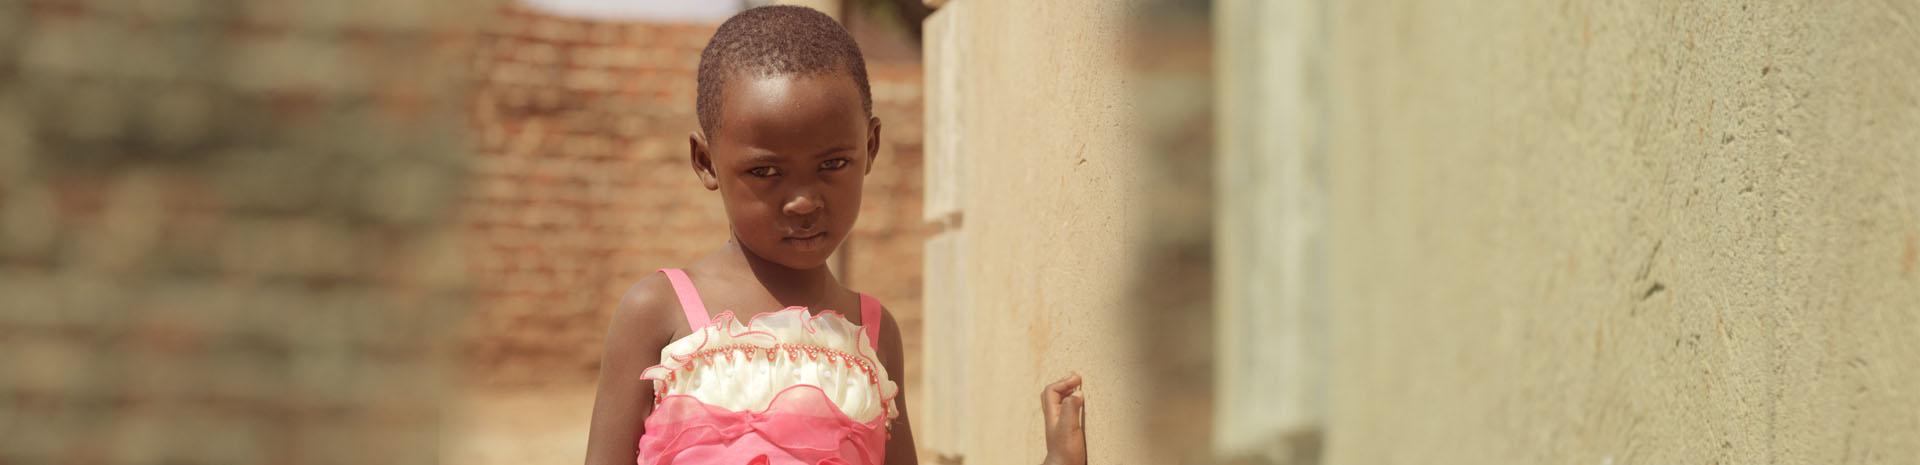 help Uganda children, Sponsor orphans in Uganda, Uganda orphans, Sponsor children in Uganda